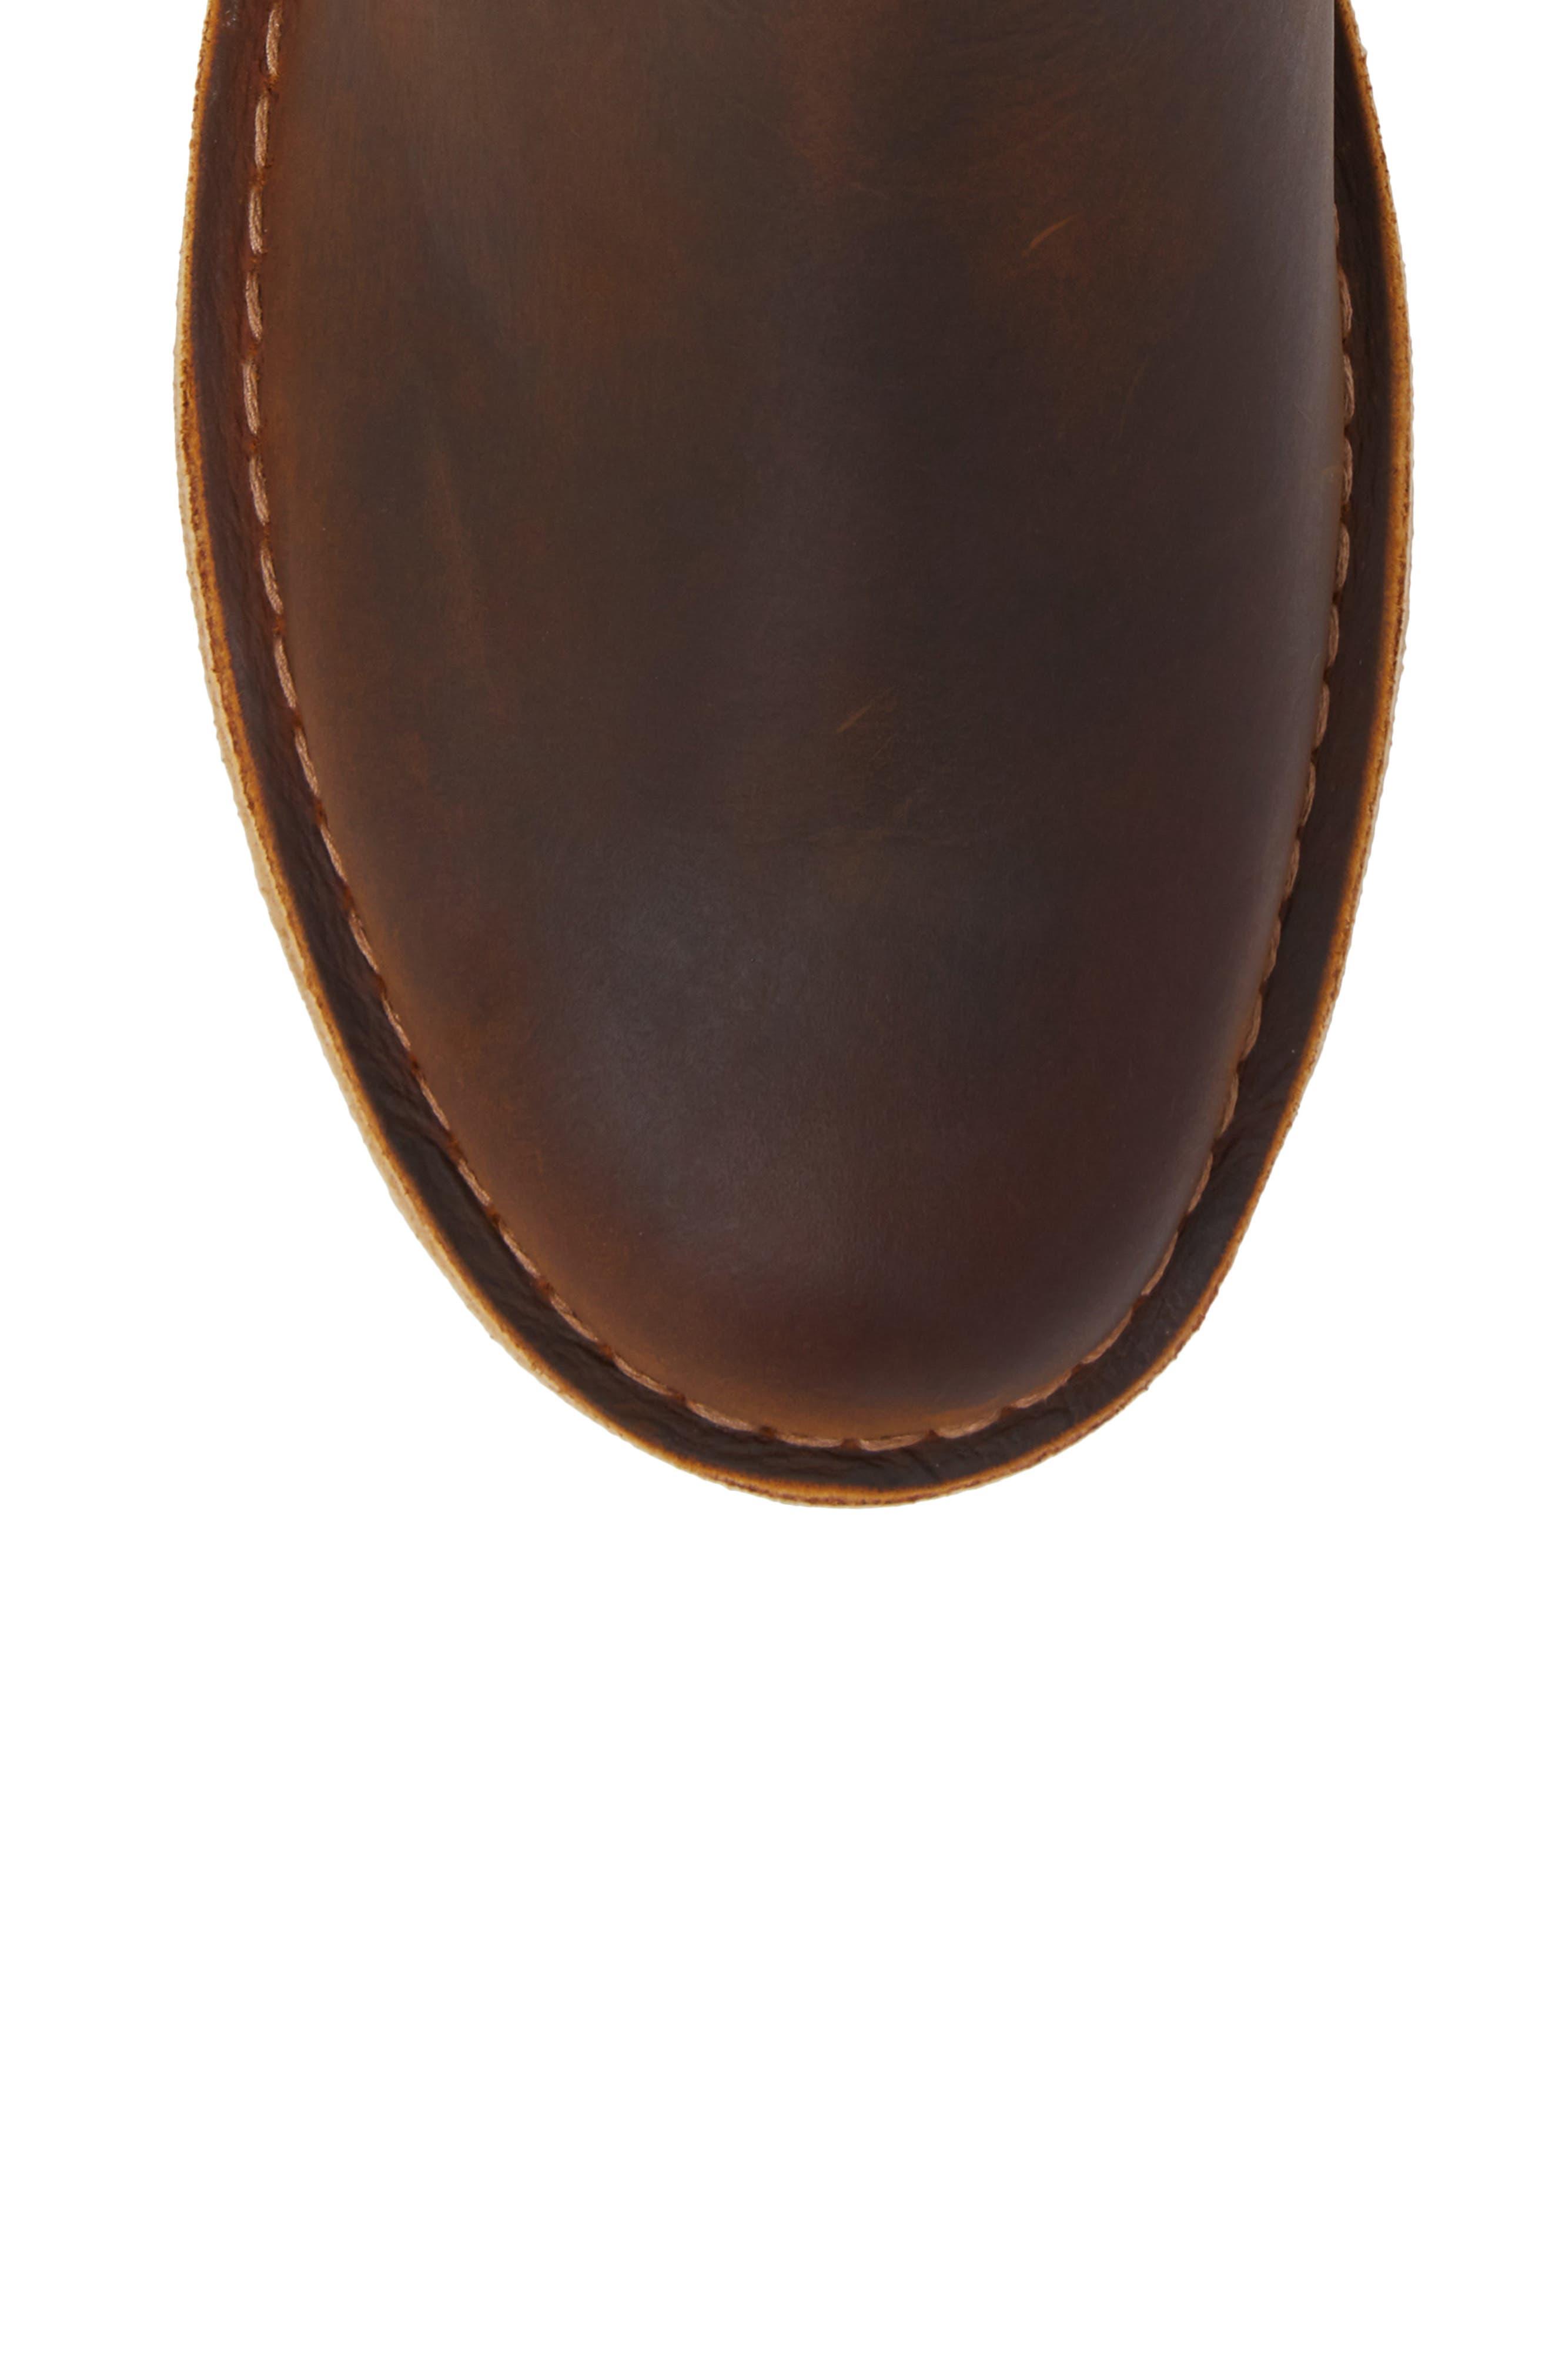 CLARKS<SUP>®</SUP>, Desert Peak Chelsea Boot, Alternate thumbnail 5, color, MEDIUM BROWN BEESWAX LEATHER